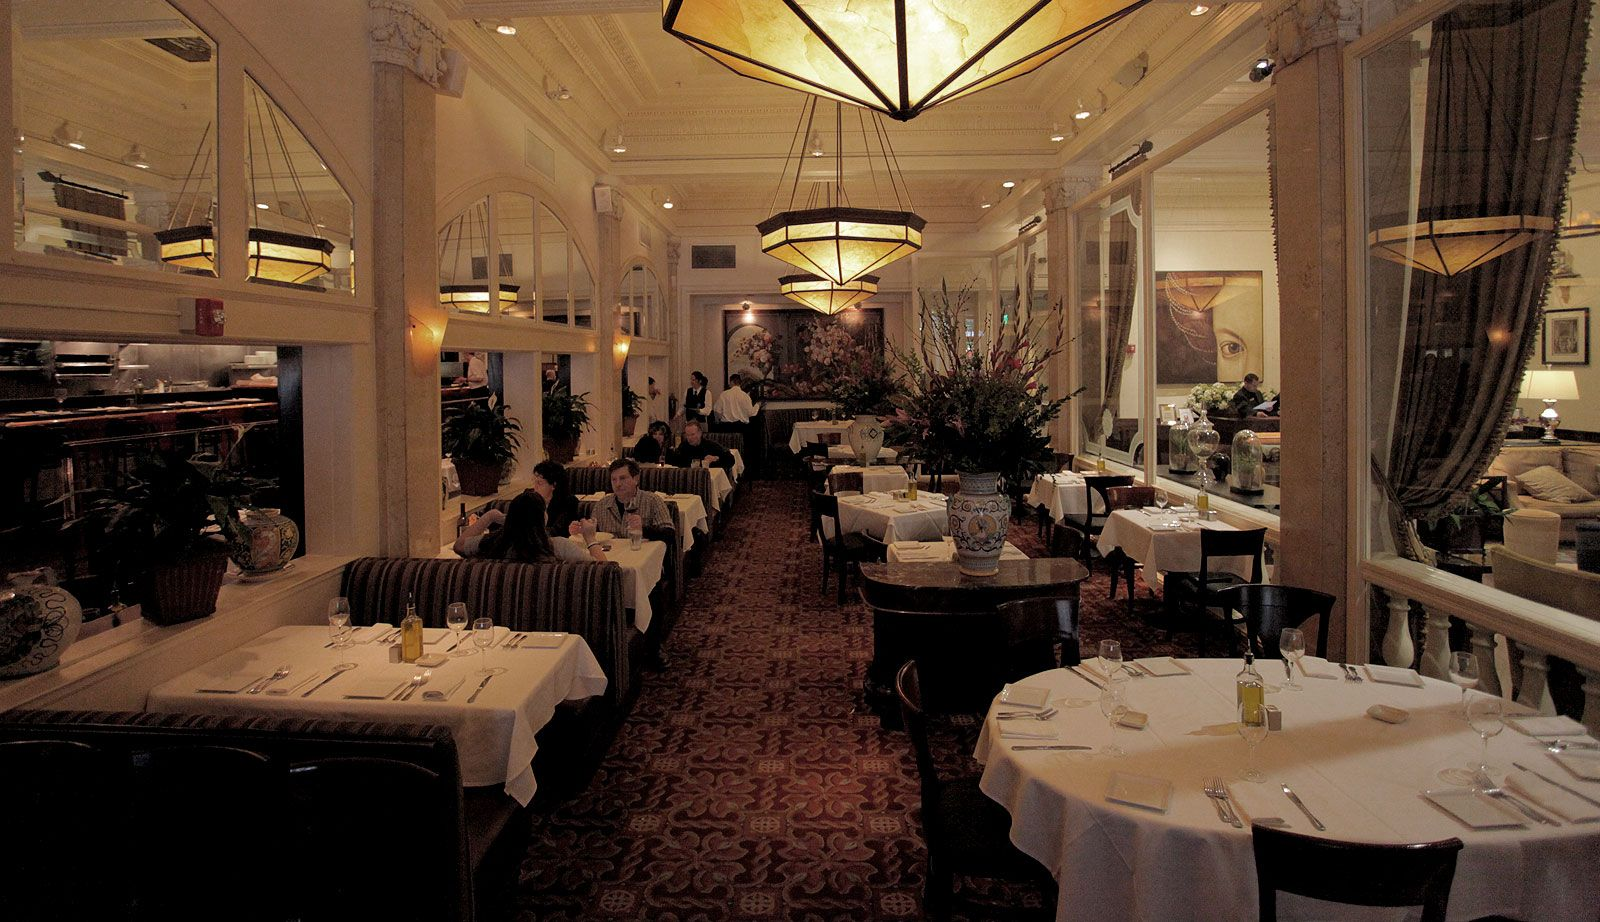 Kuleto S Authentic Italian Restaurant In Union Square San Francisco